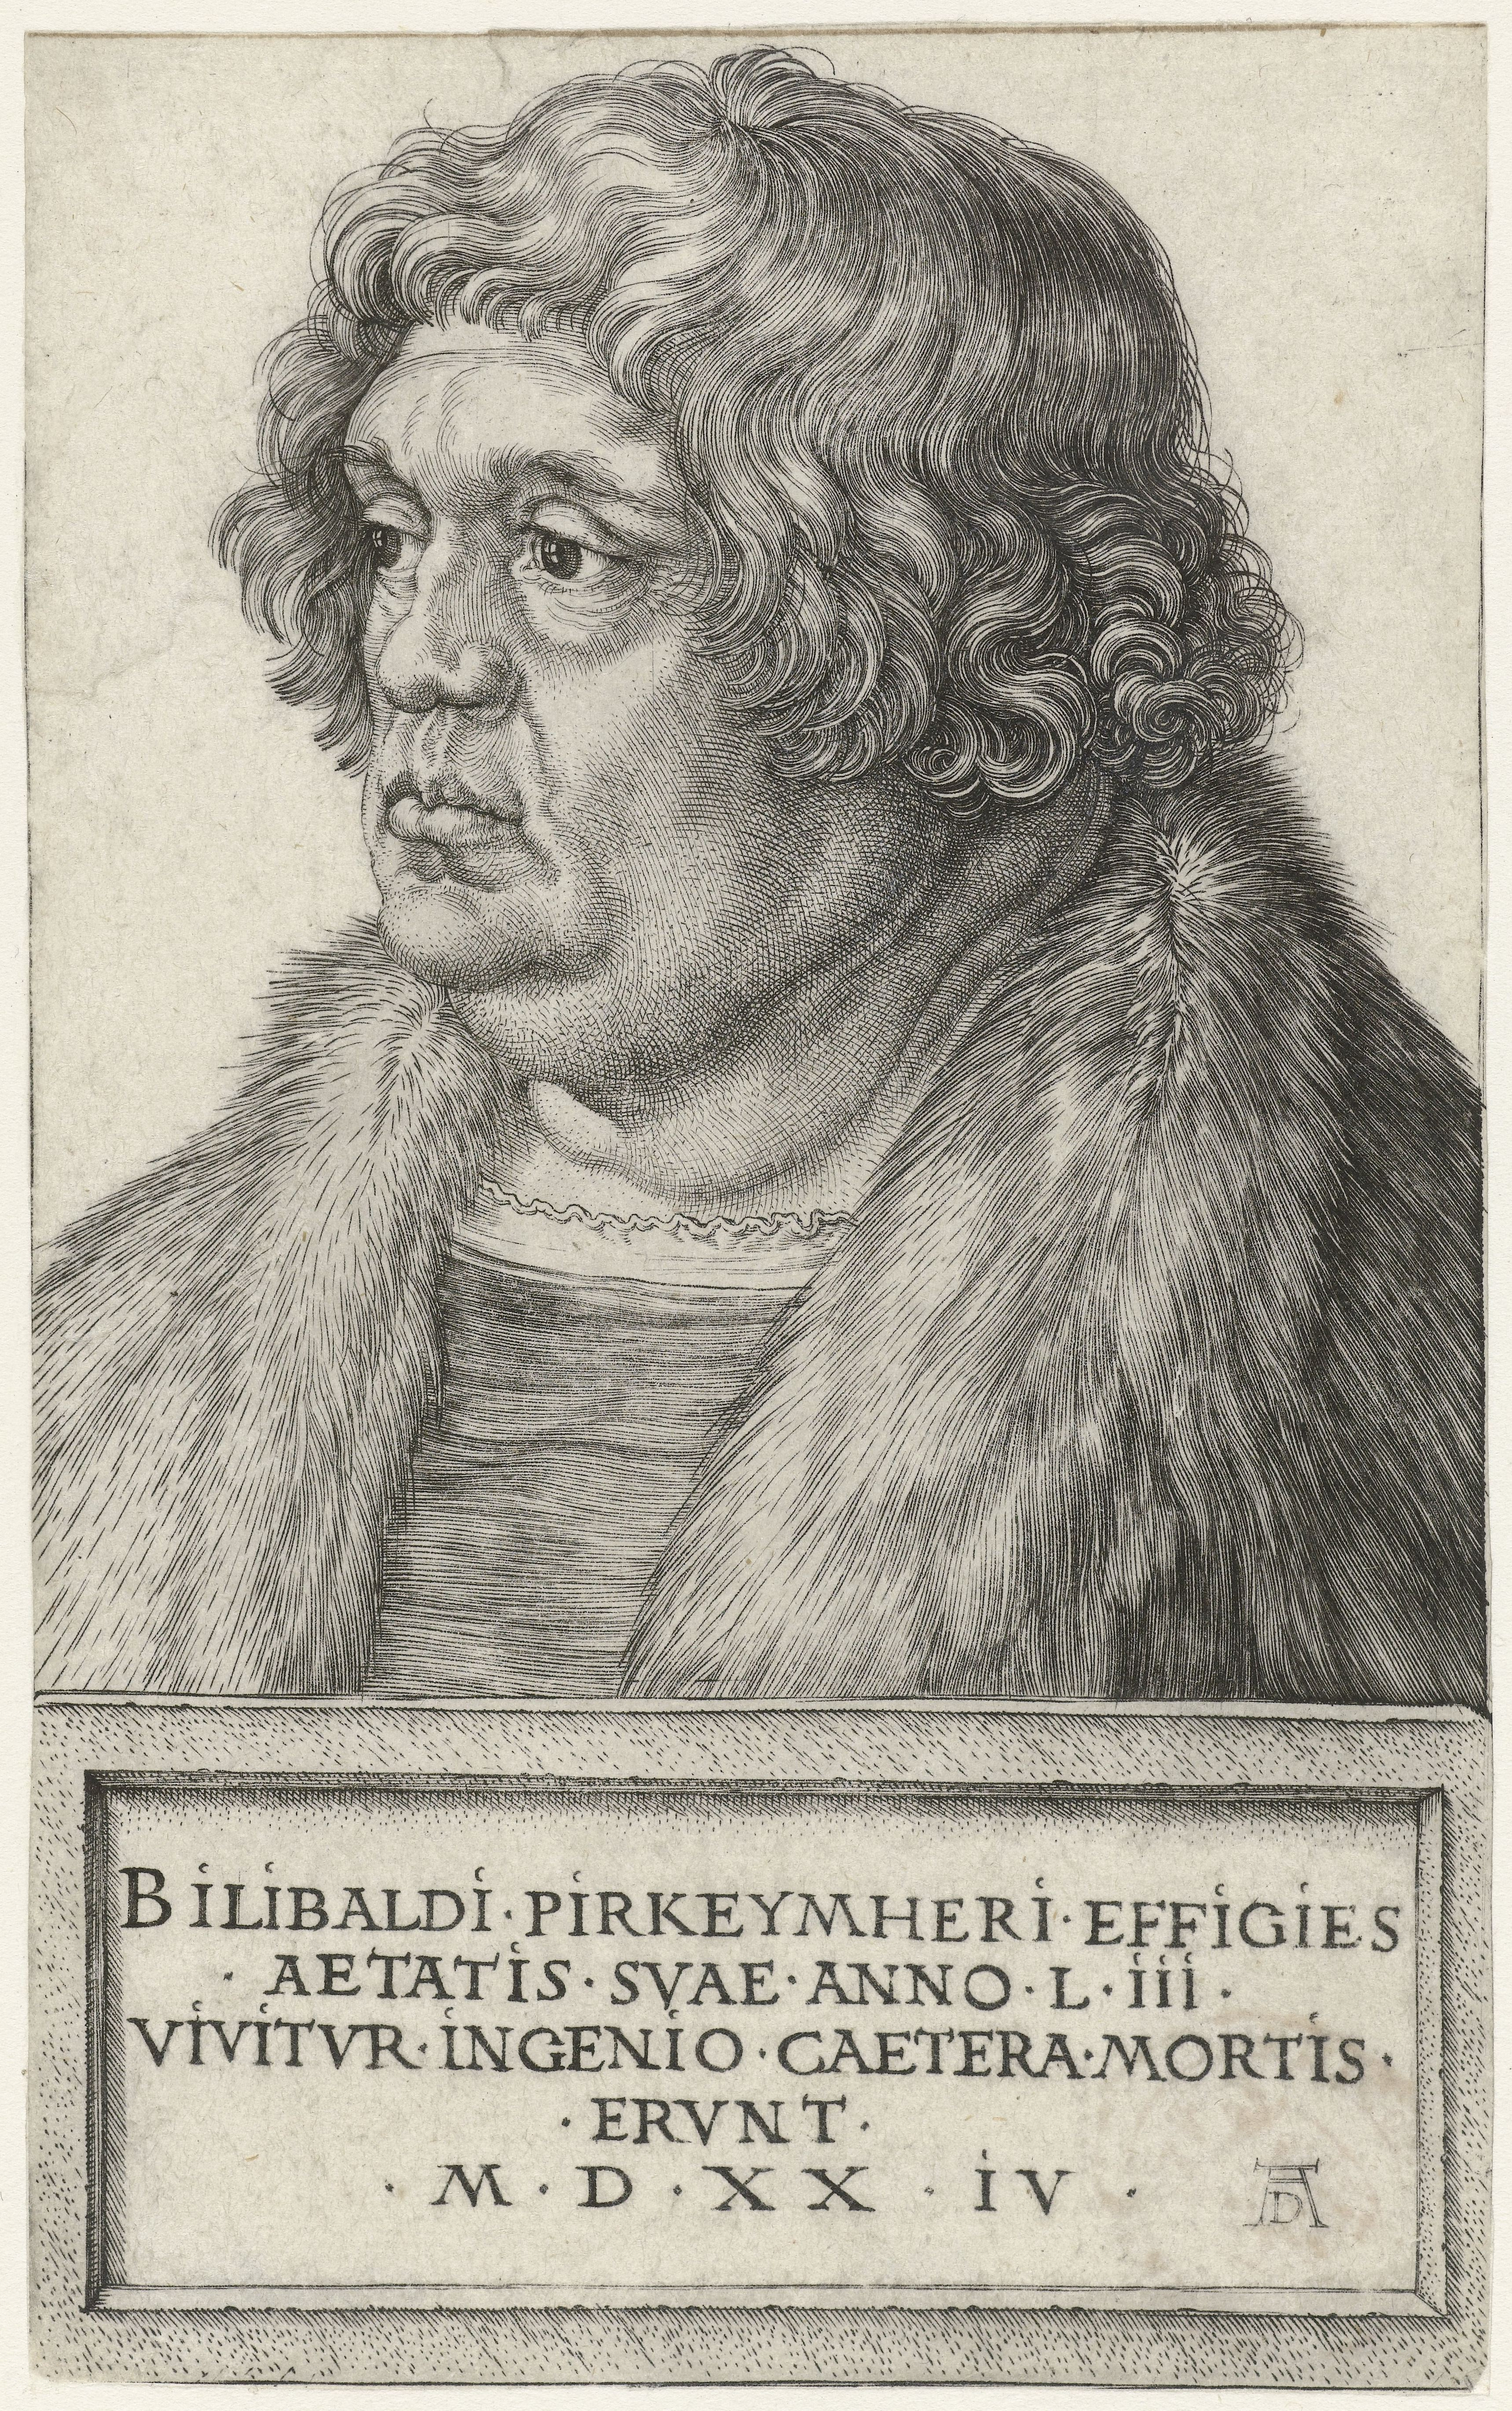 [[Engraving]] of Willibald Pirckheimer at 53 by Albrecht Dürer, 1524. ''We live by the spirit. The rest belongs to death.''